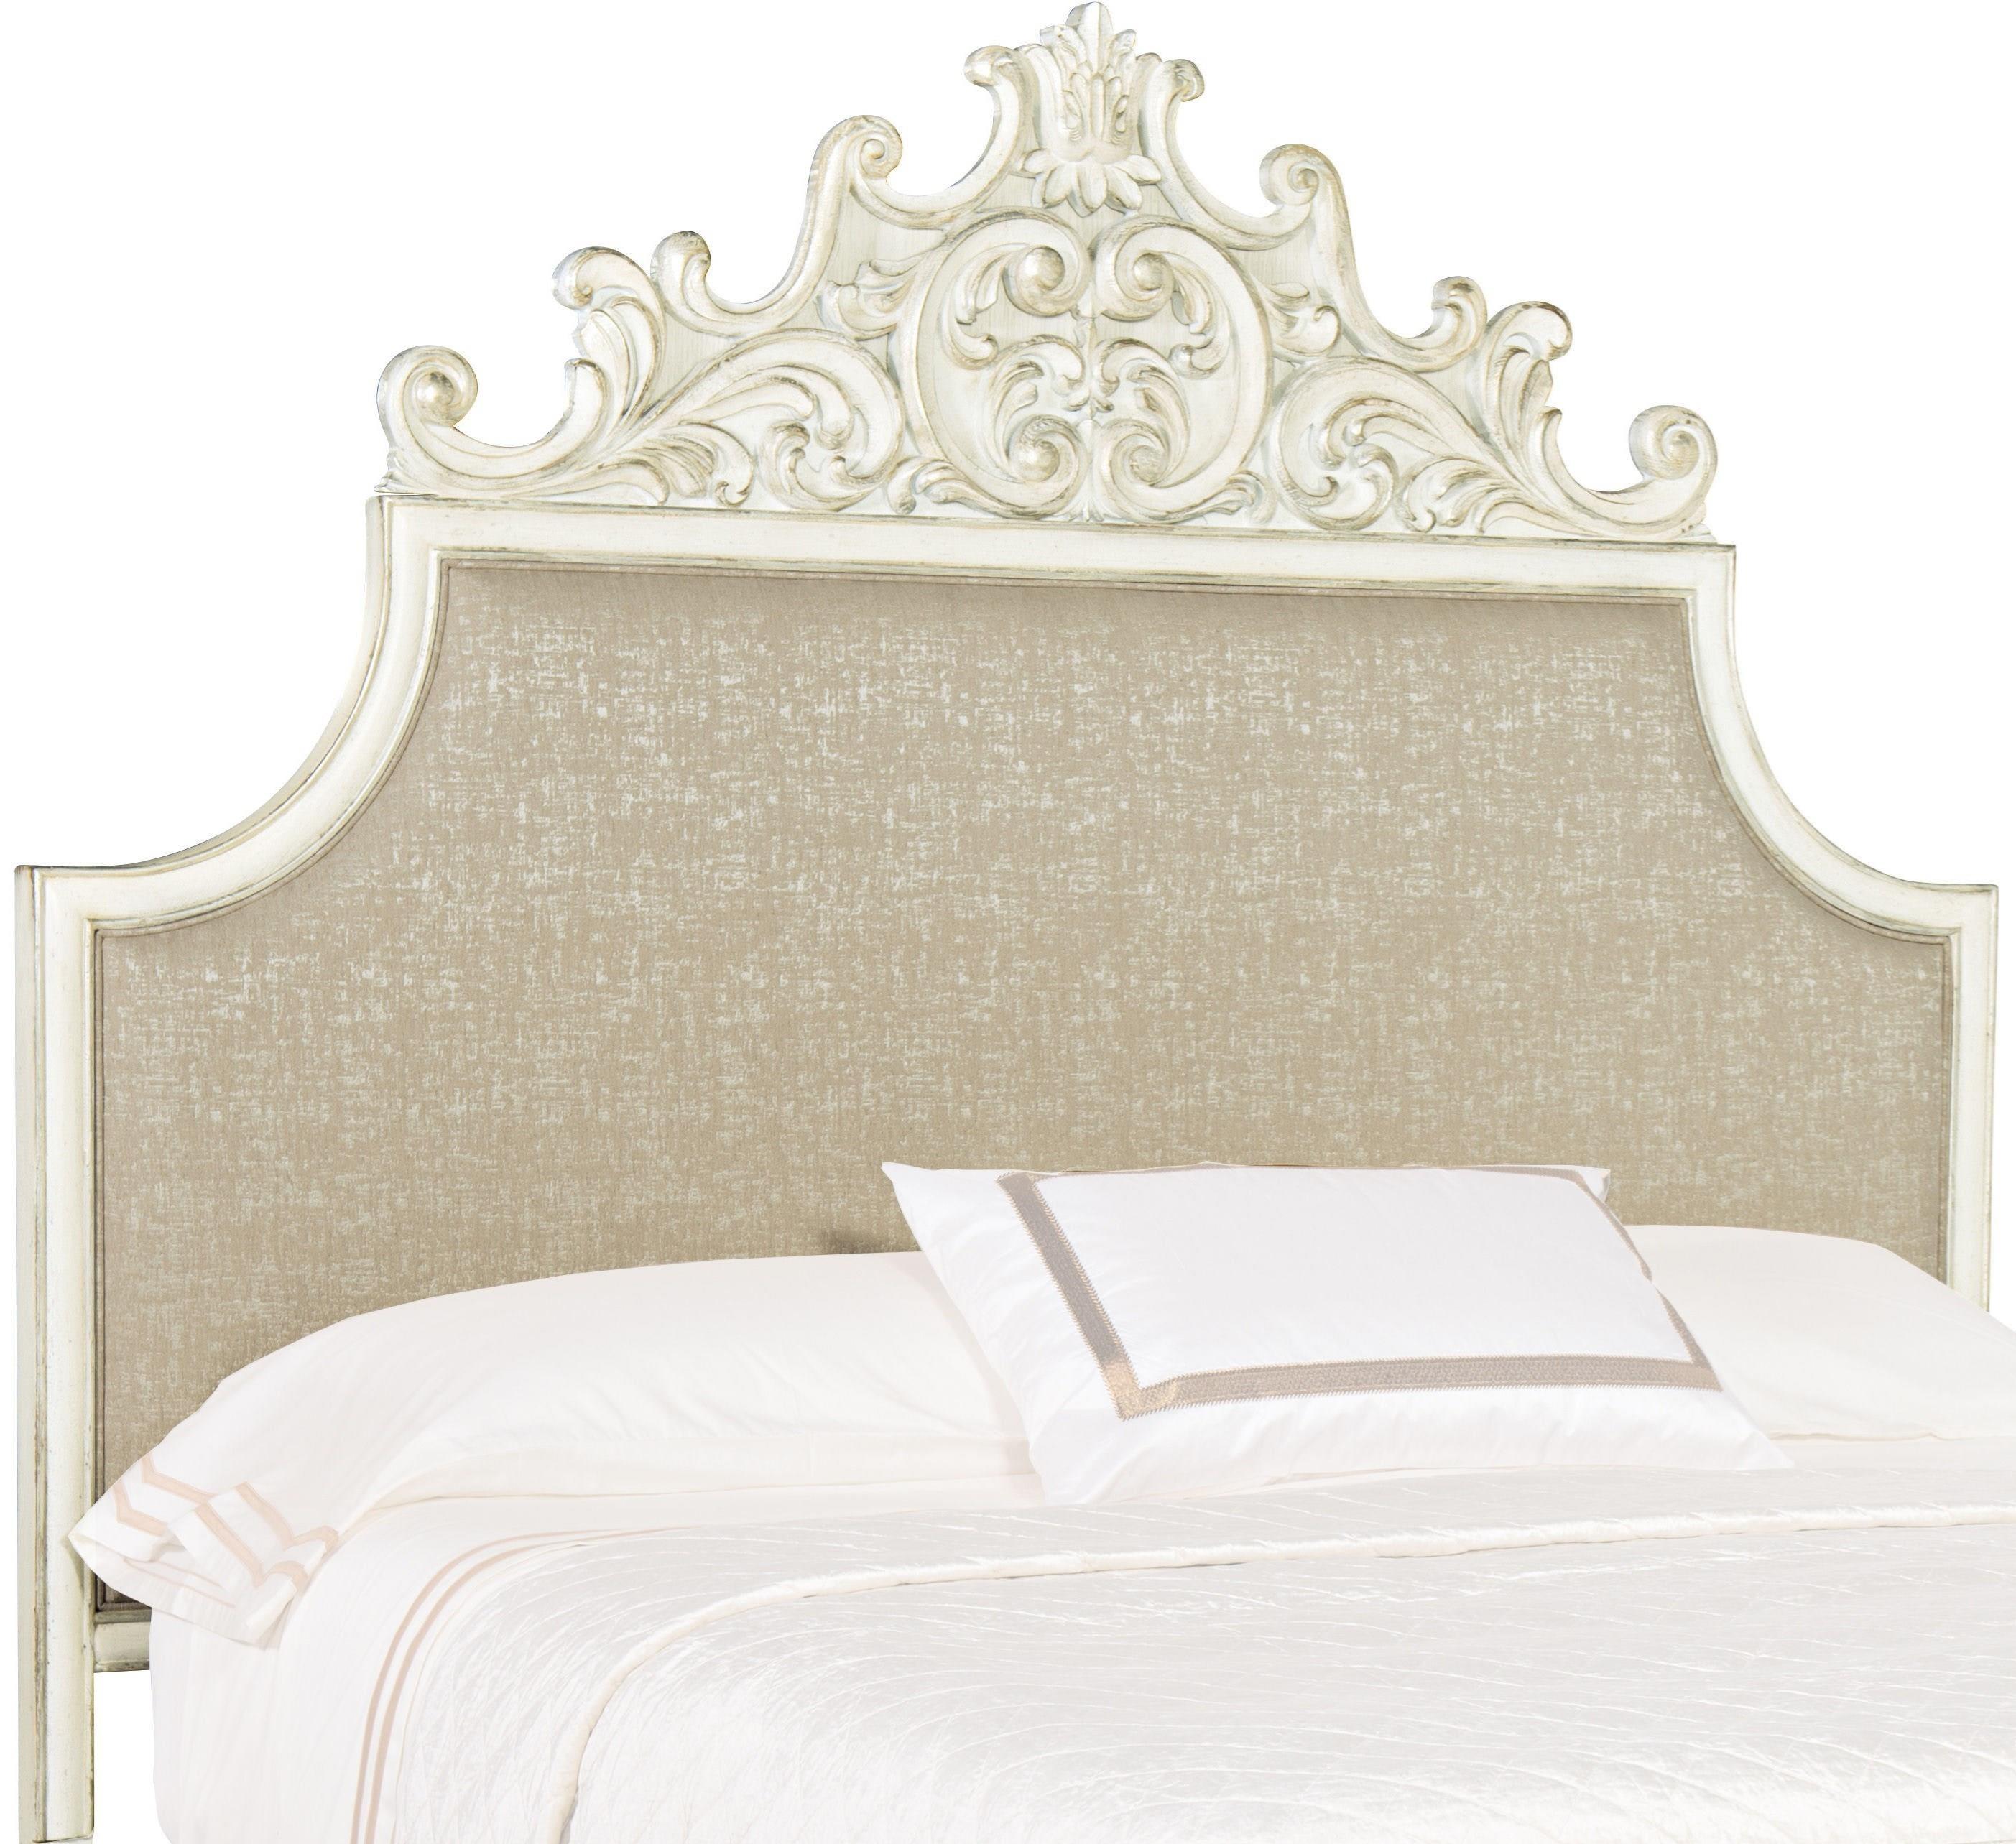 Sanctuary Anastasie King-CA King Upholstered Headboard by Hooker Furniture at Baer's Furniture